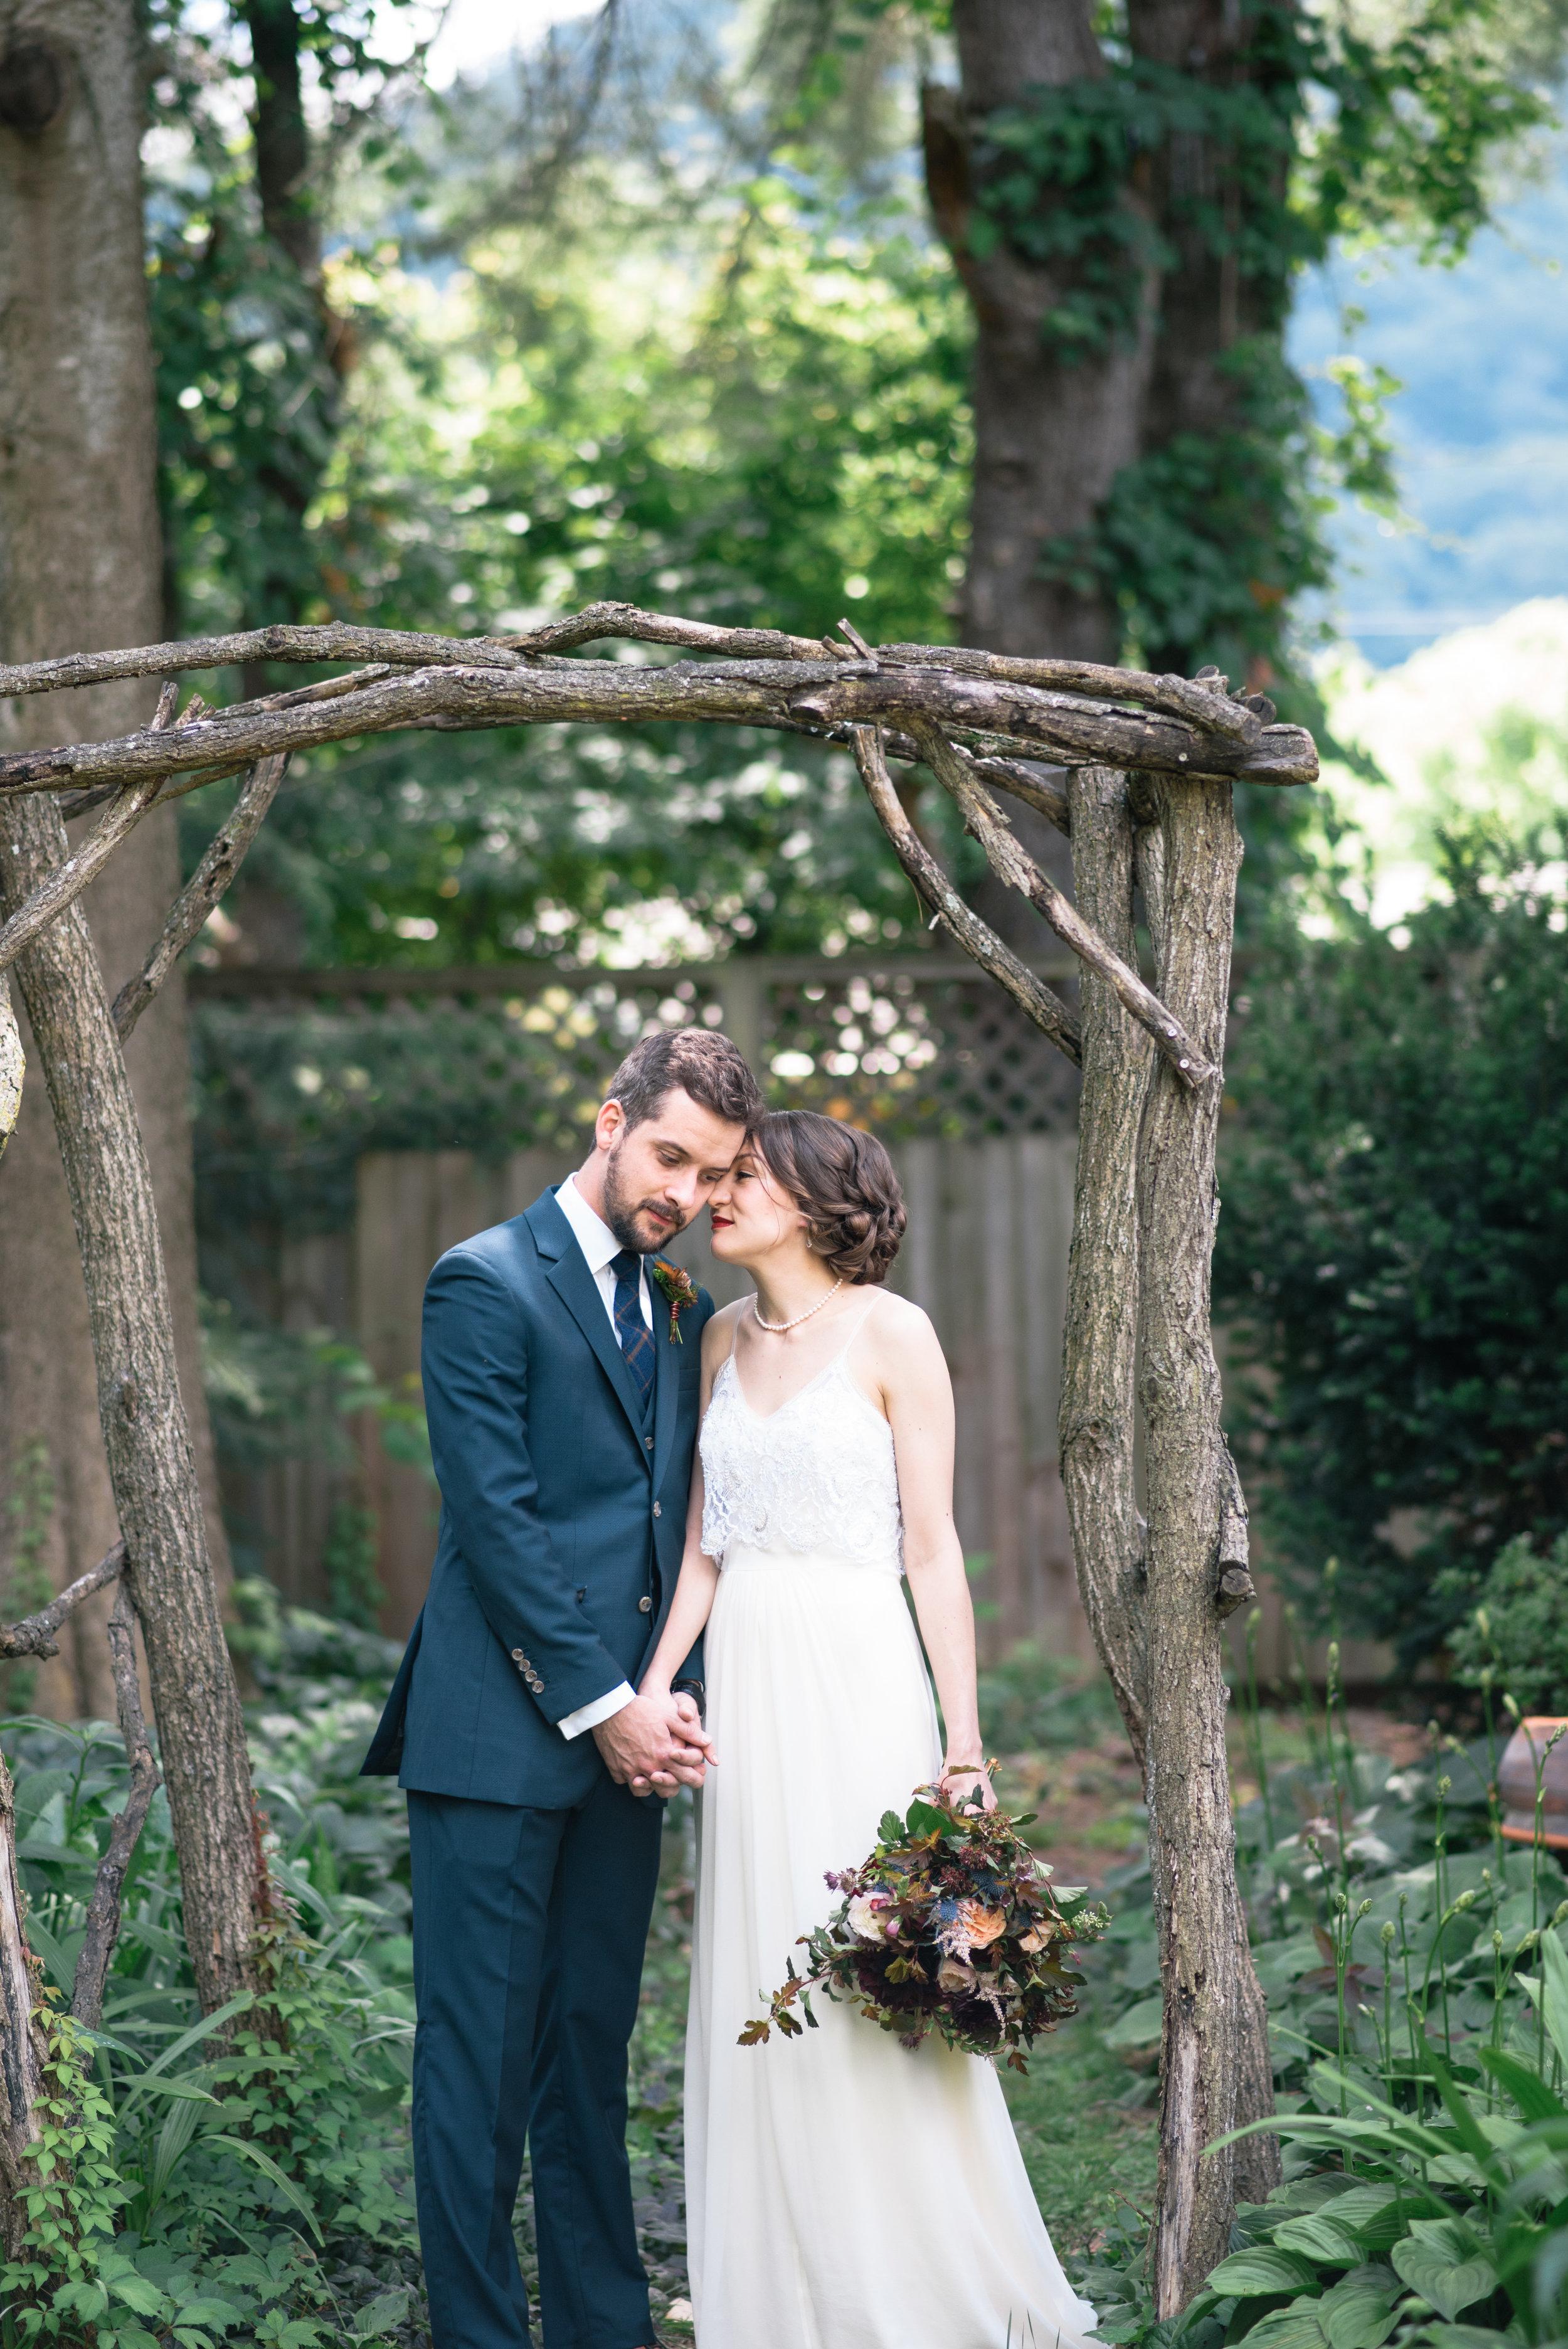 lauren-and-tim-north-carolina-wedding-meg-hill-photo- (171 of 511).jpg